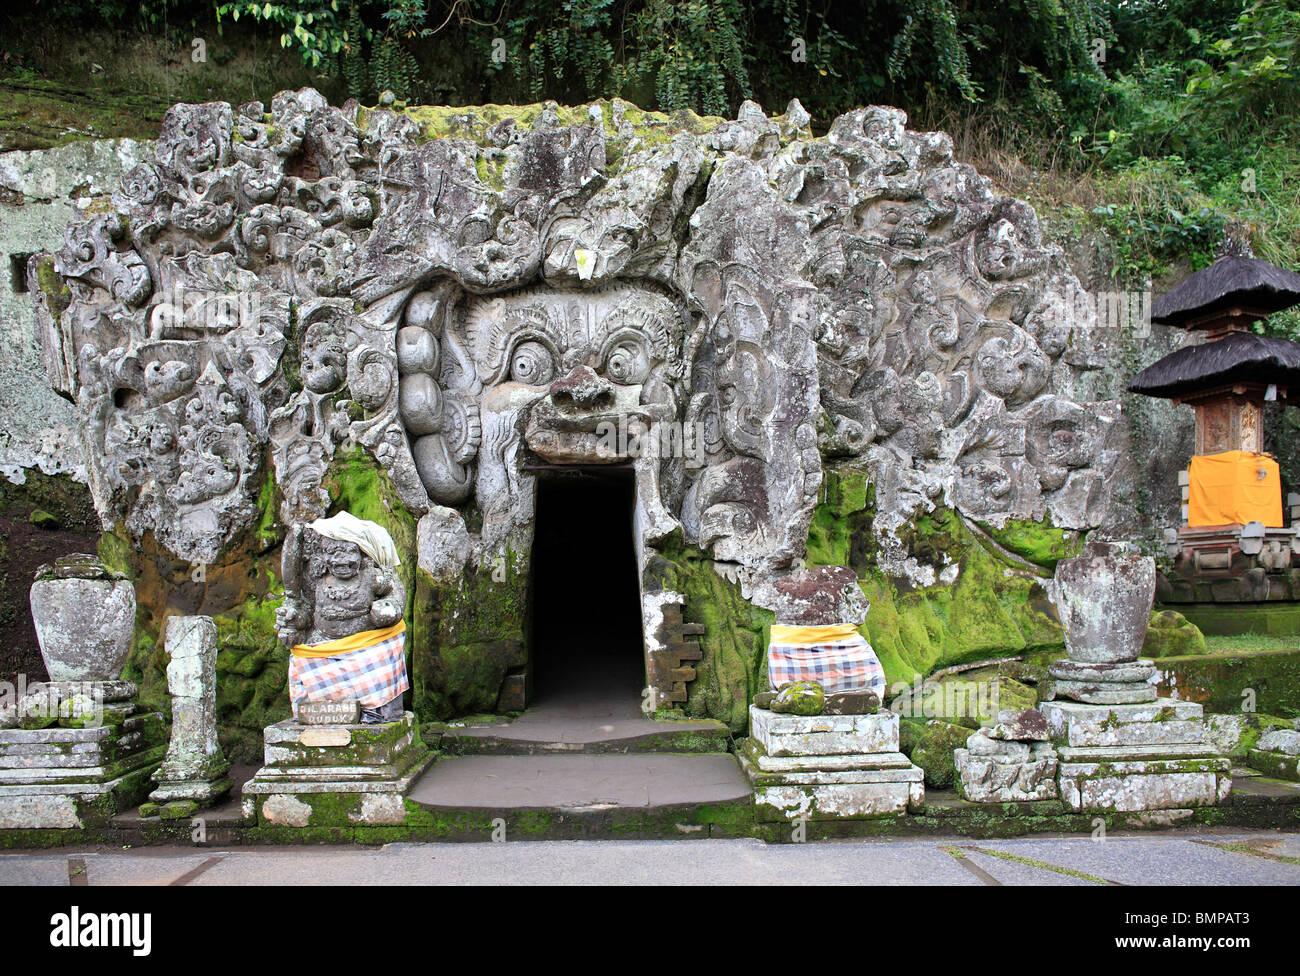 Elephant Cave at Goa Gajah Temple, Bedulu, near Ubud, Bali, Indonesia. - Stock Image